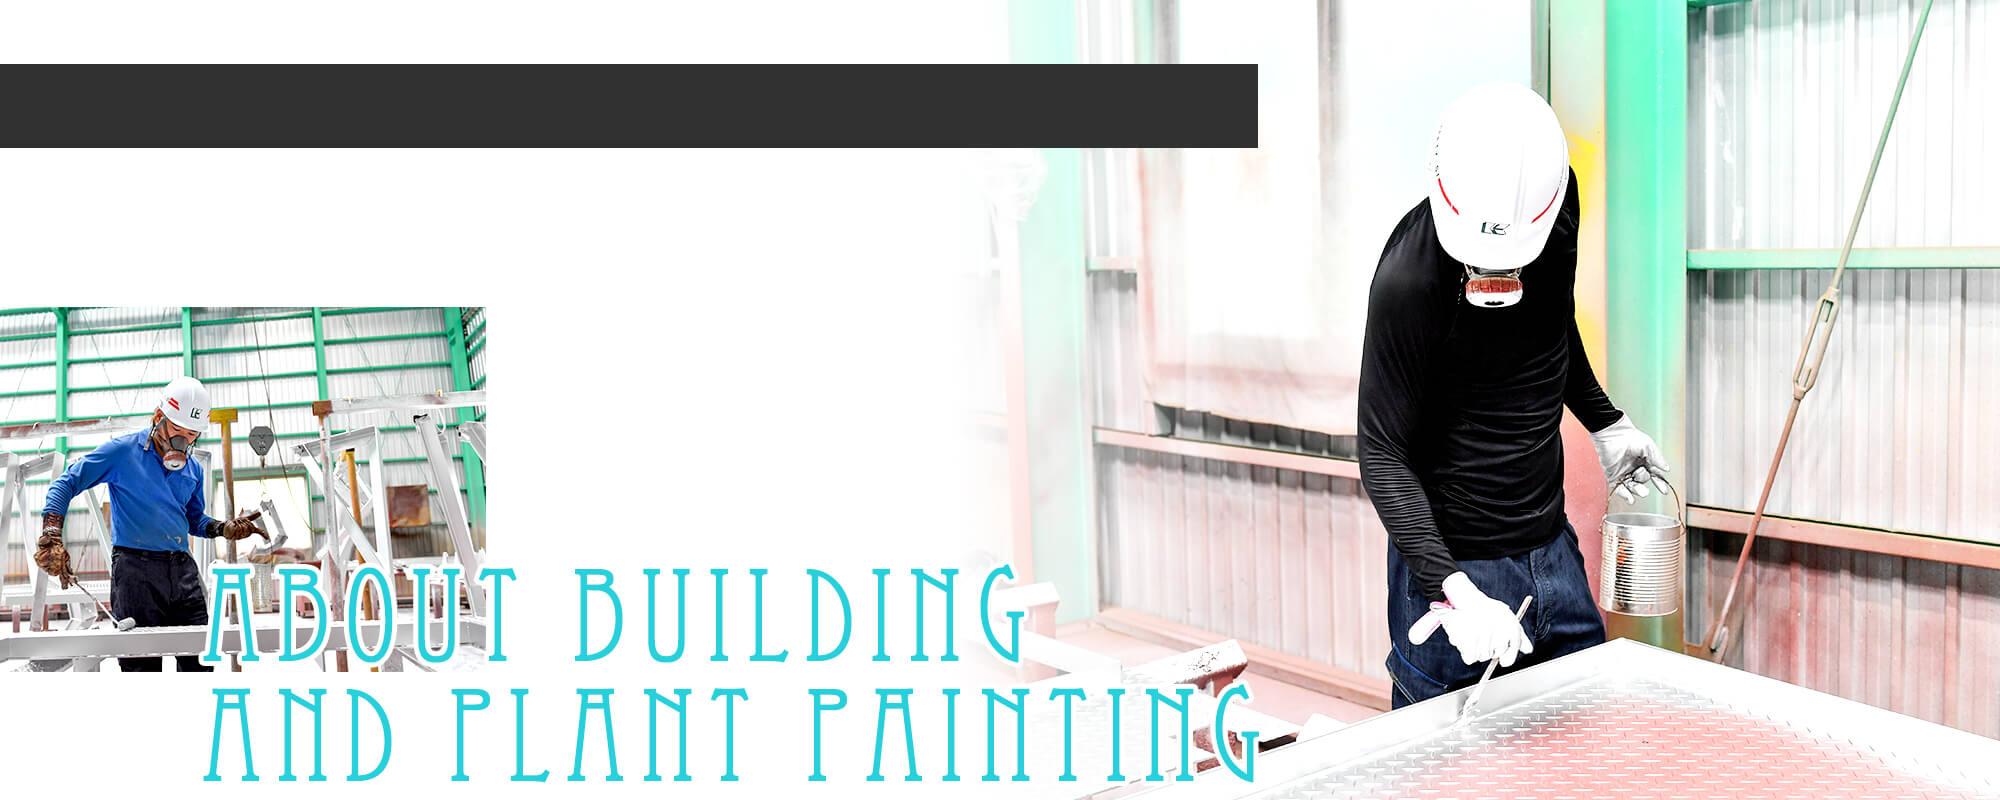 building_bg_01